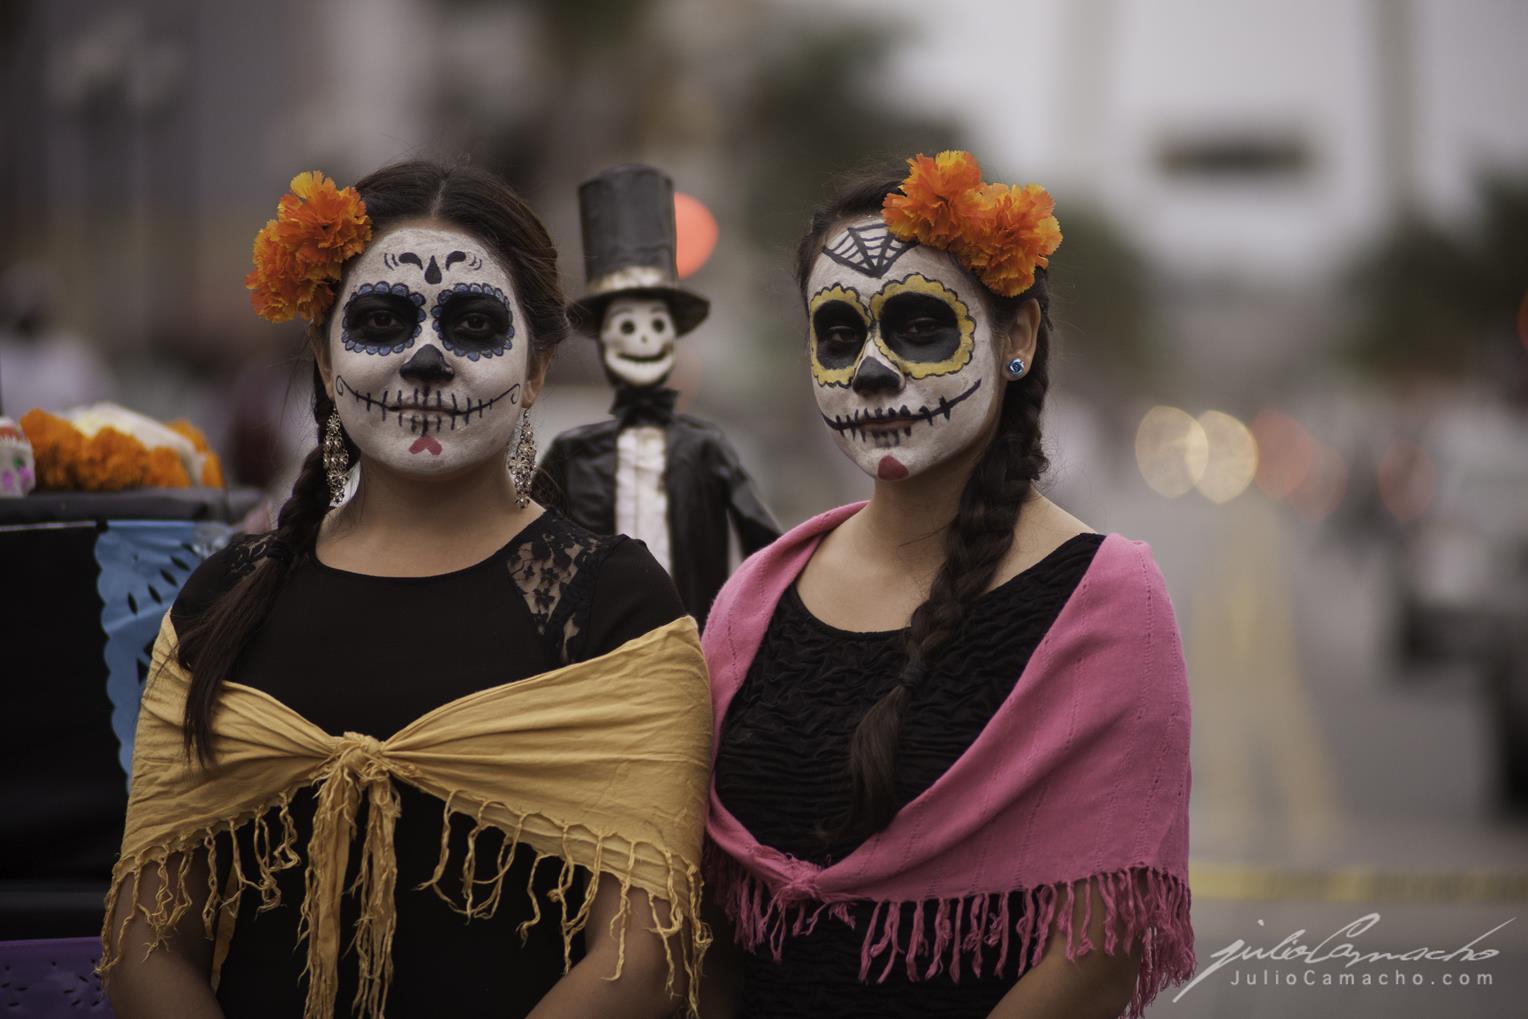 2014-10-30 31 CAST TOUR Ensenada y Tijuana - 1276 - www.Juli (Copy).jpg